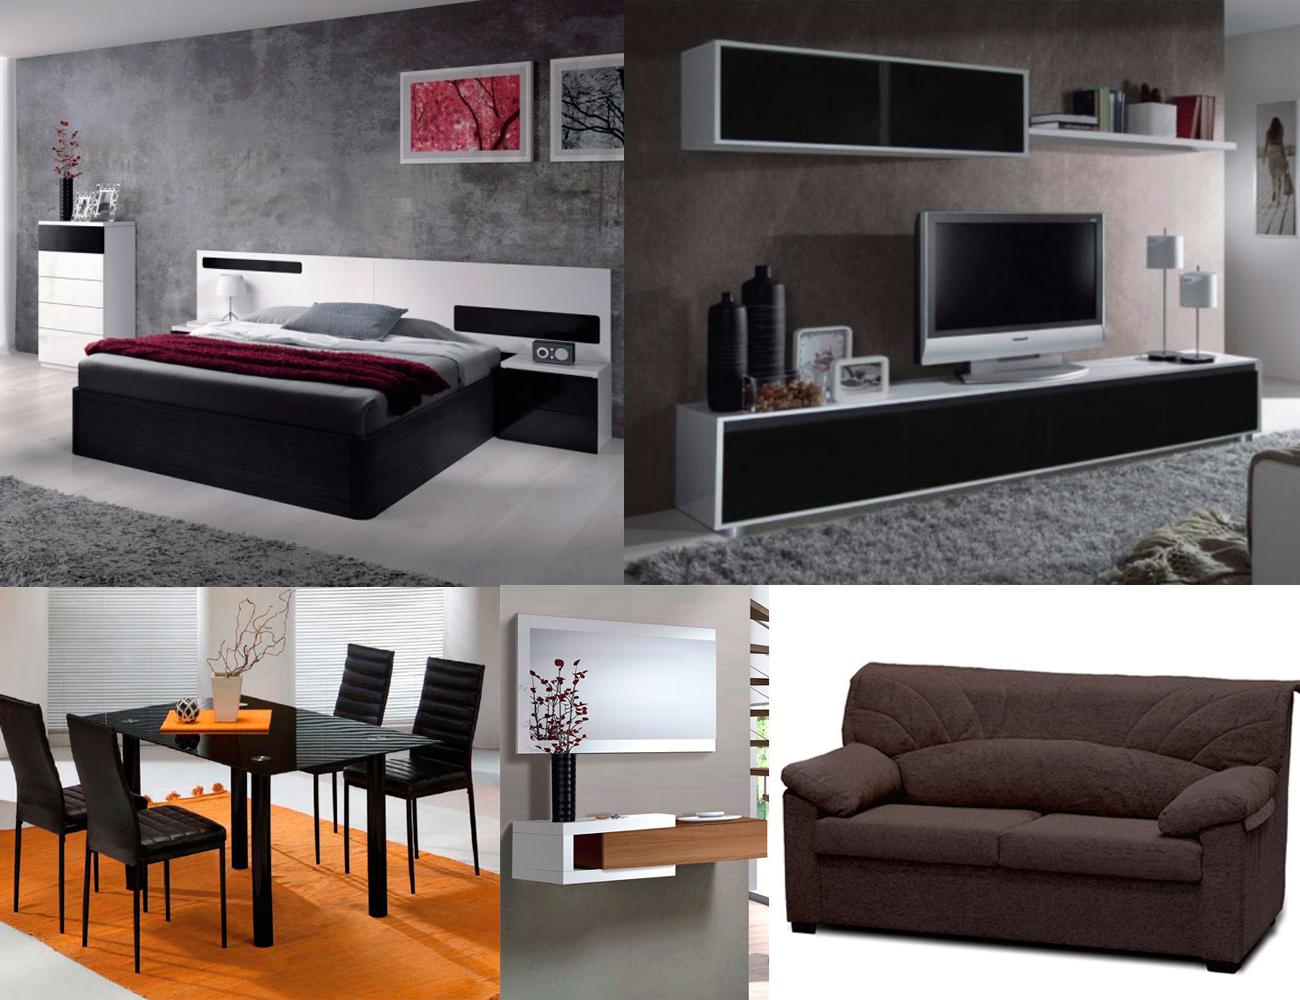 Amueblar Piso Completo Tldn Muebles Piso Pleto Conforama Obtenga Ideas Diseà O De Muebles